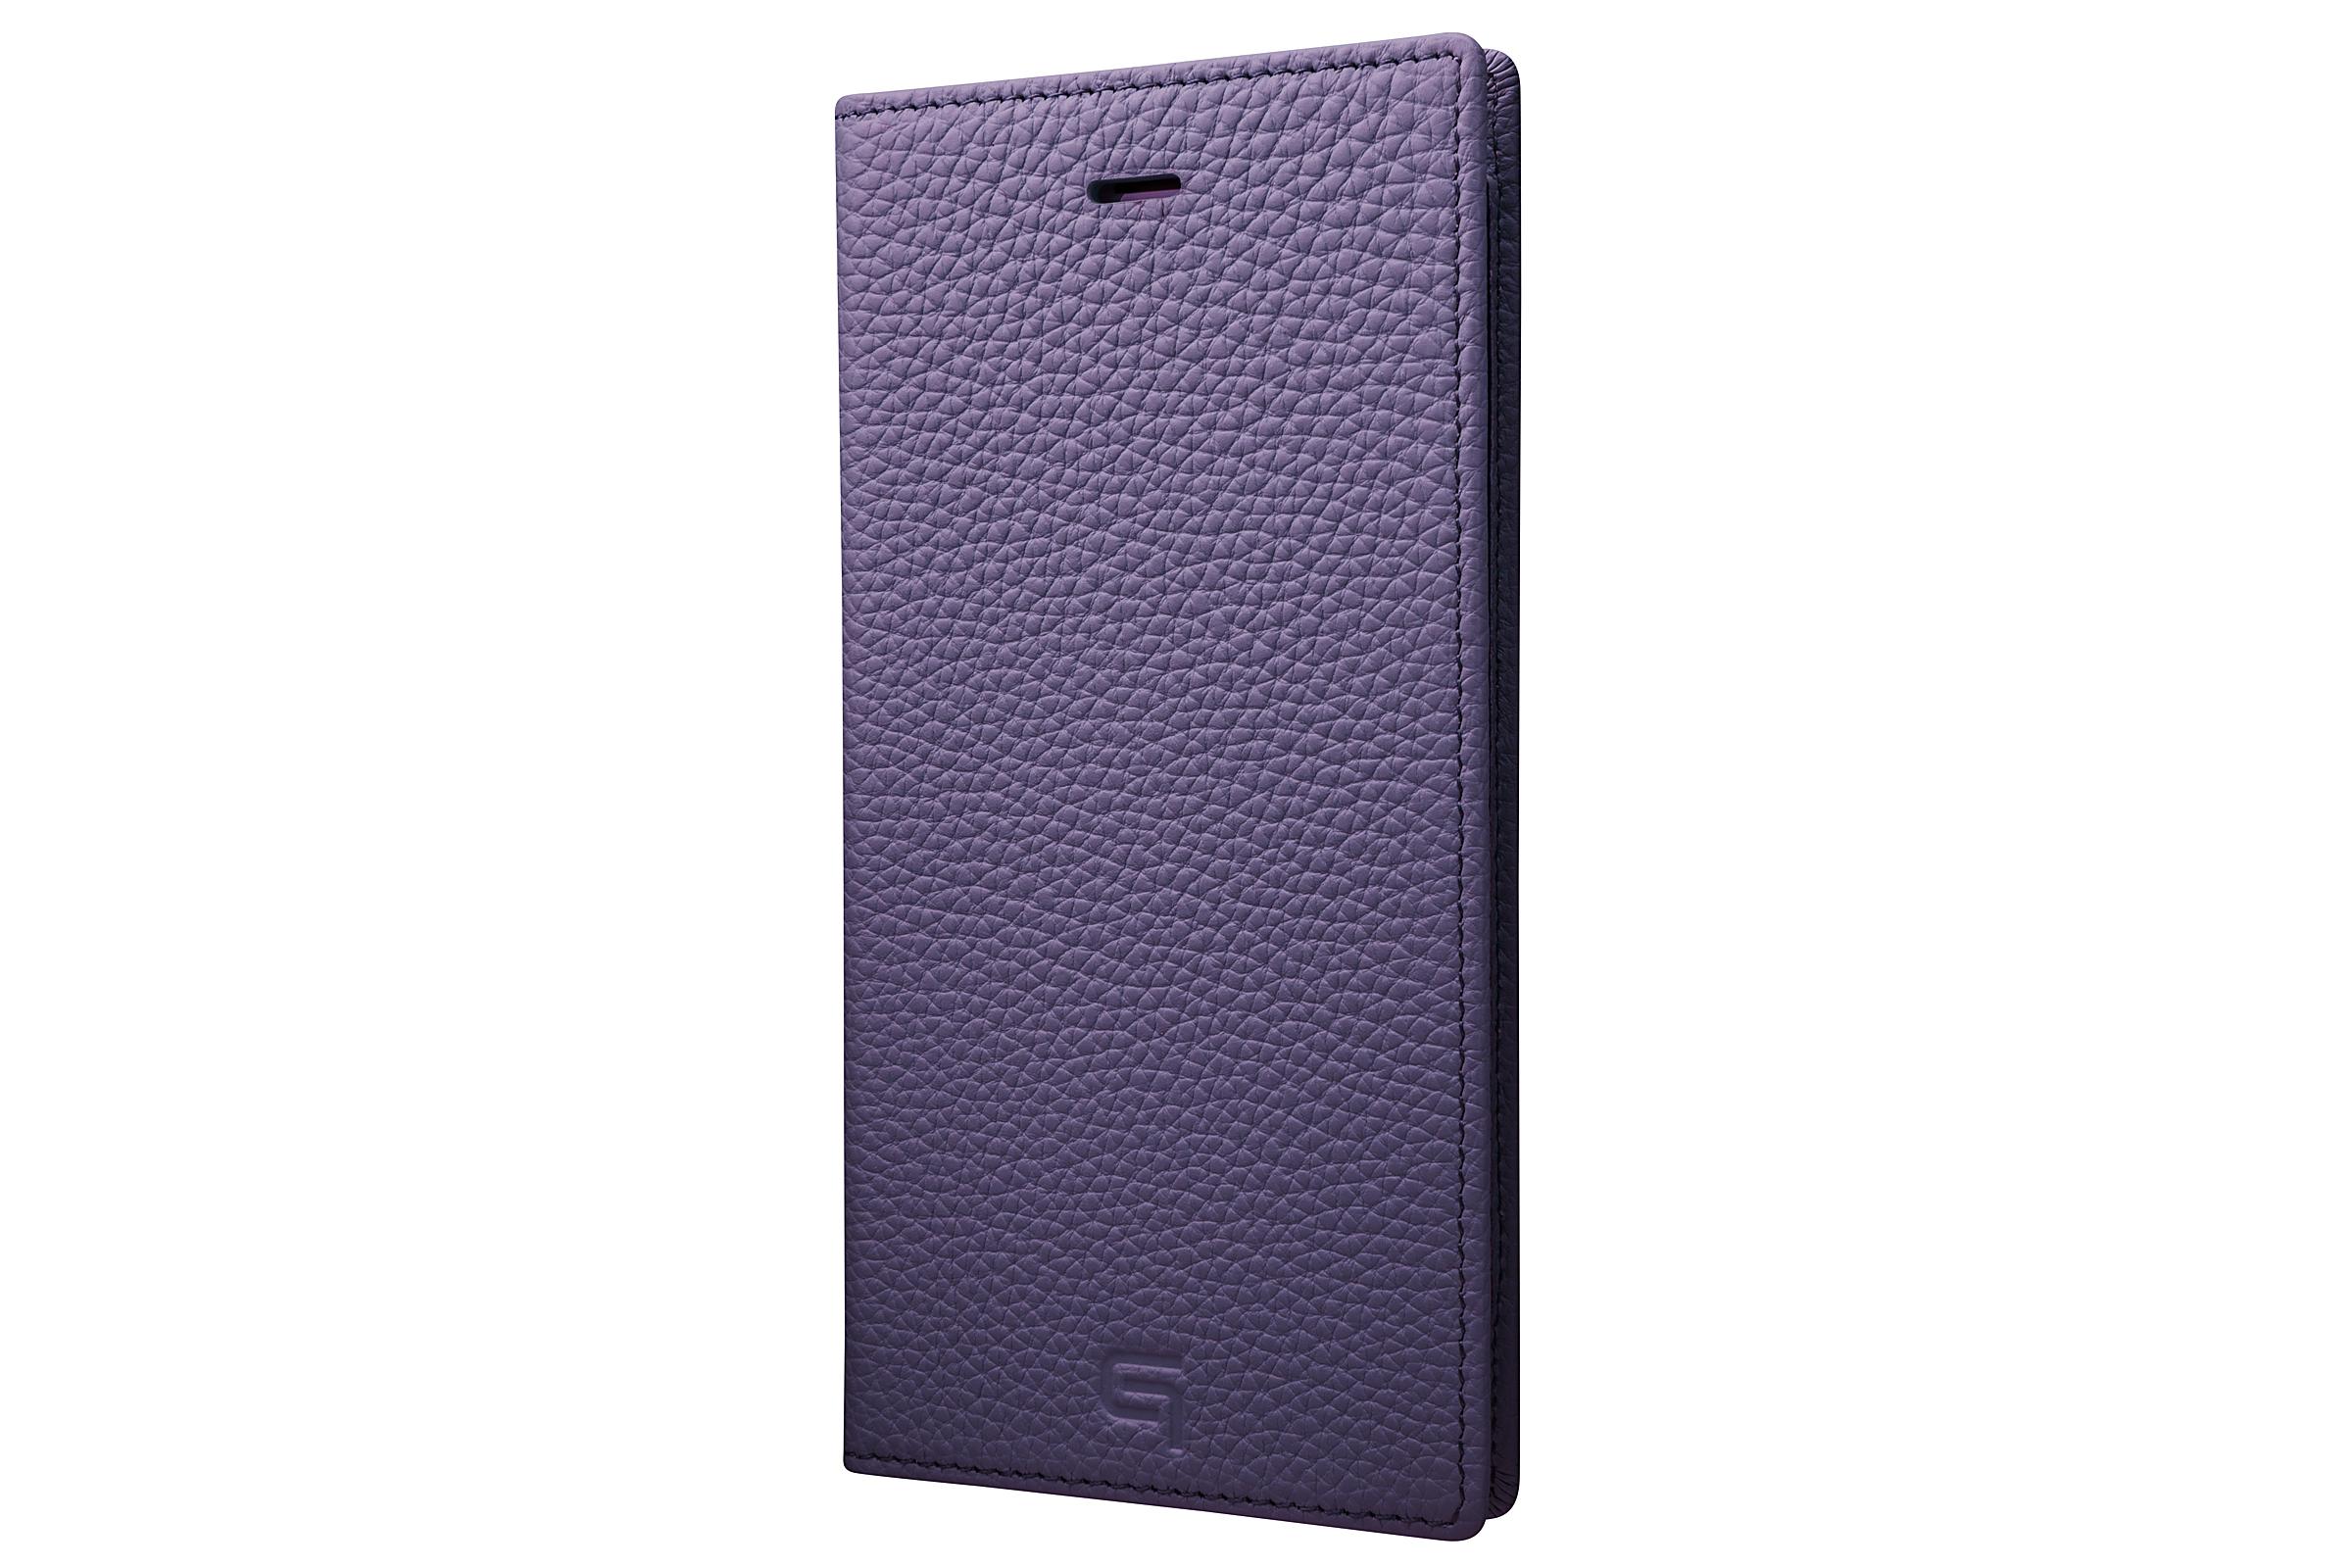 GRAMAS Shrunken-calf Full Leather Case for iPhone 7 Plus(Purple) シュランケンカーフ 手帳型フルレザーケース - 画像1